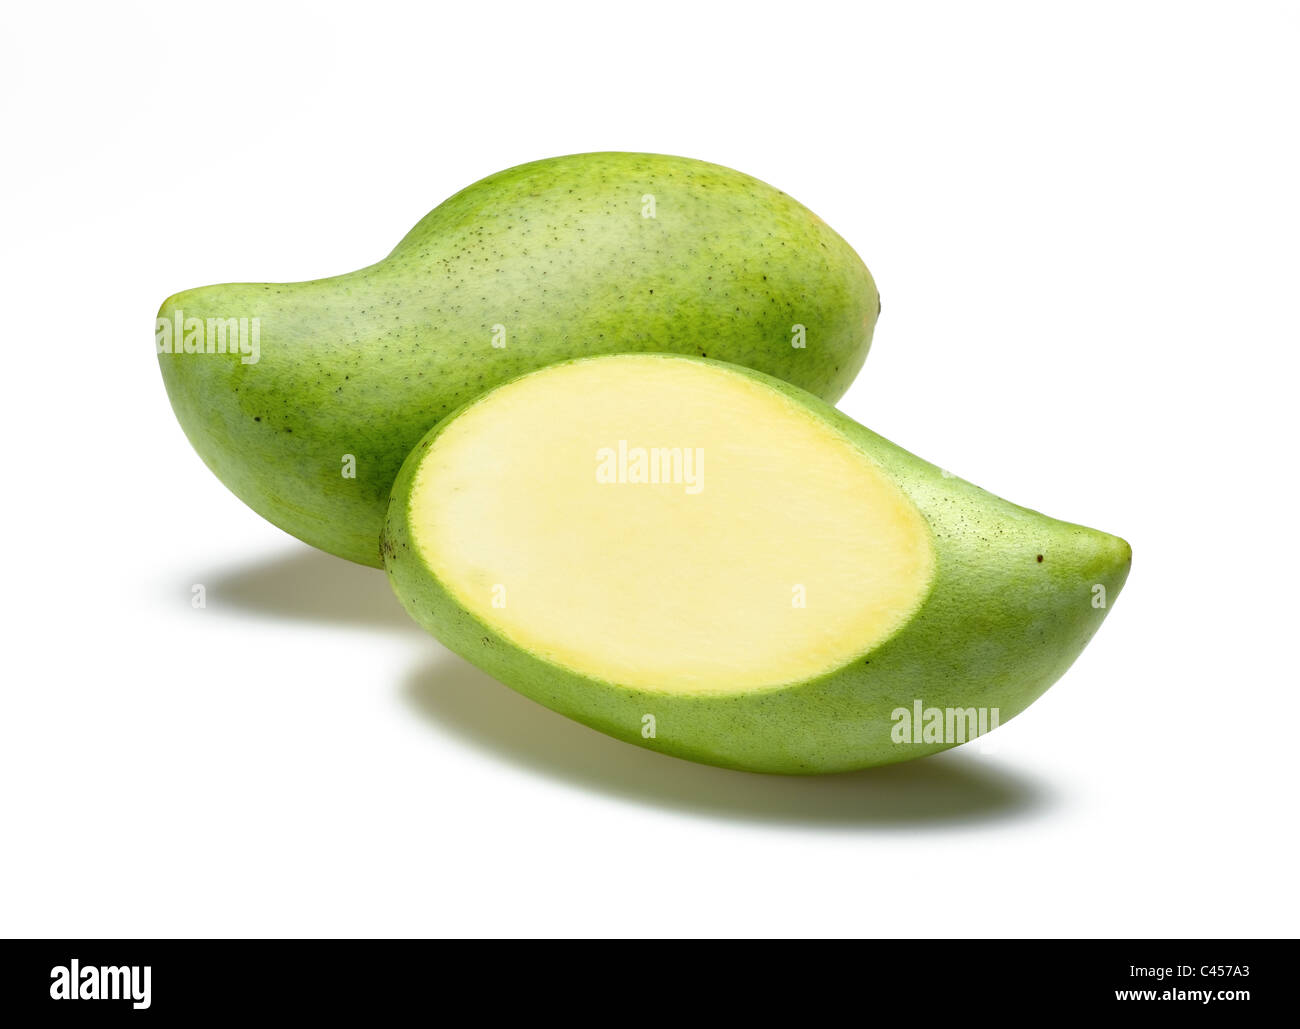 Sour Mango - Stock Image